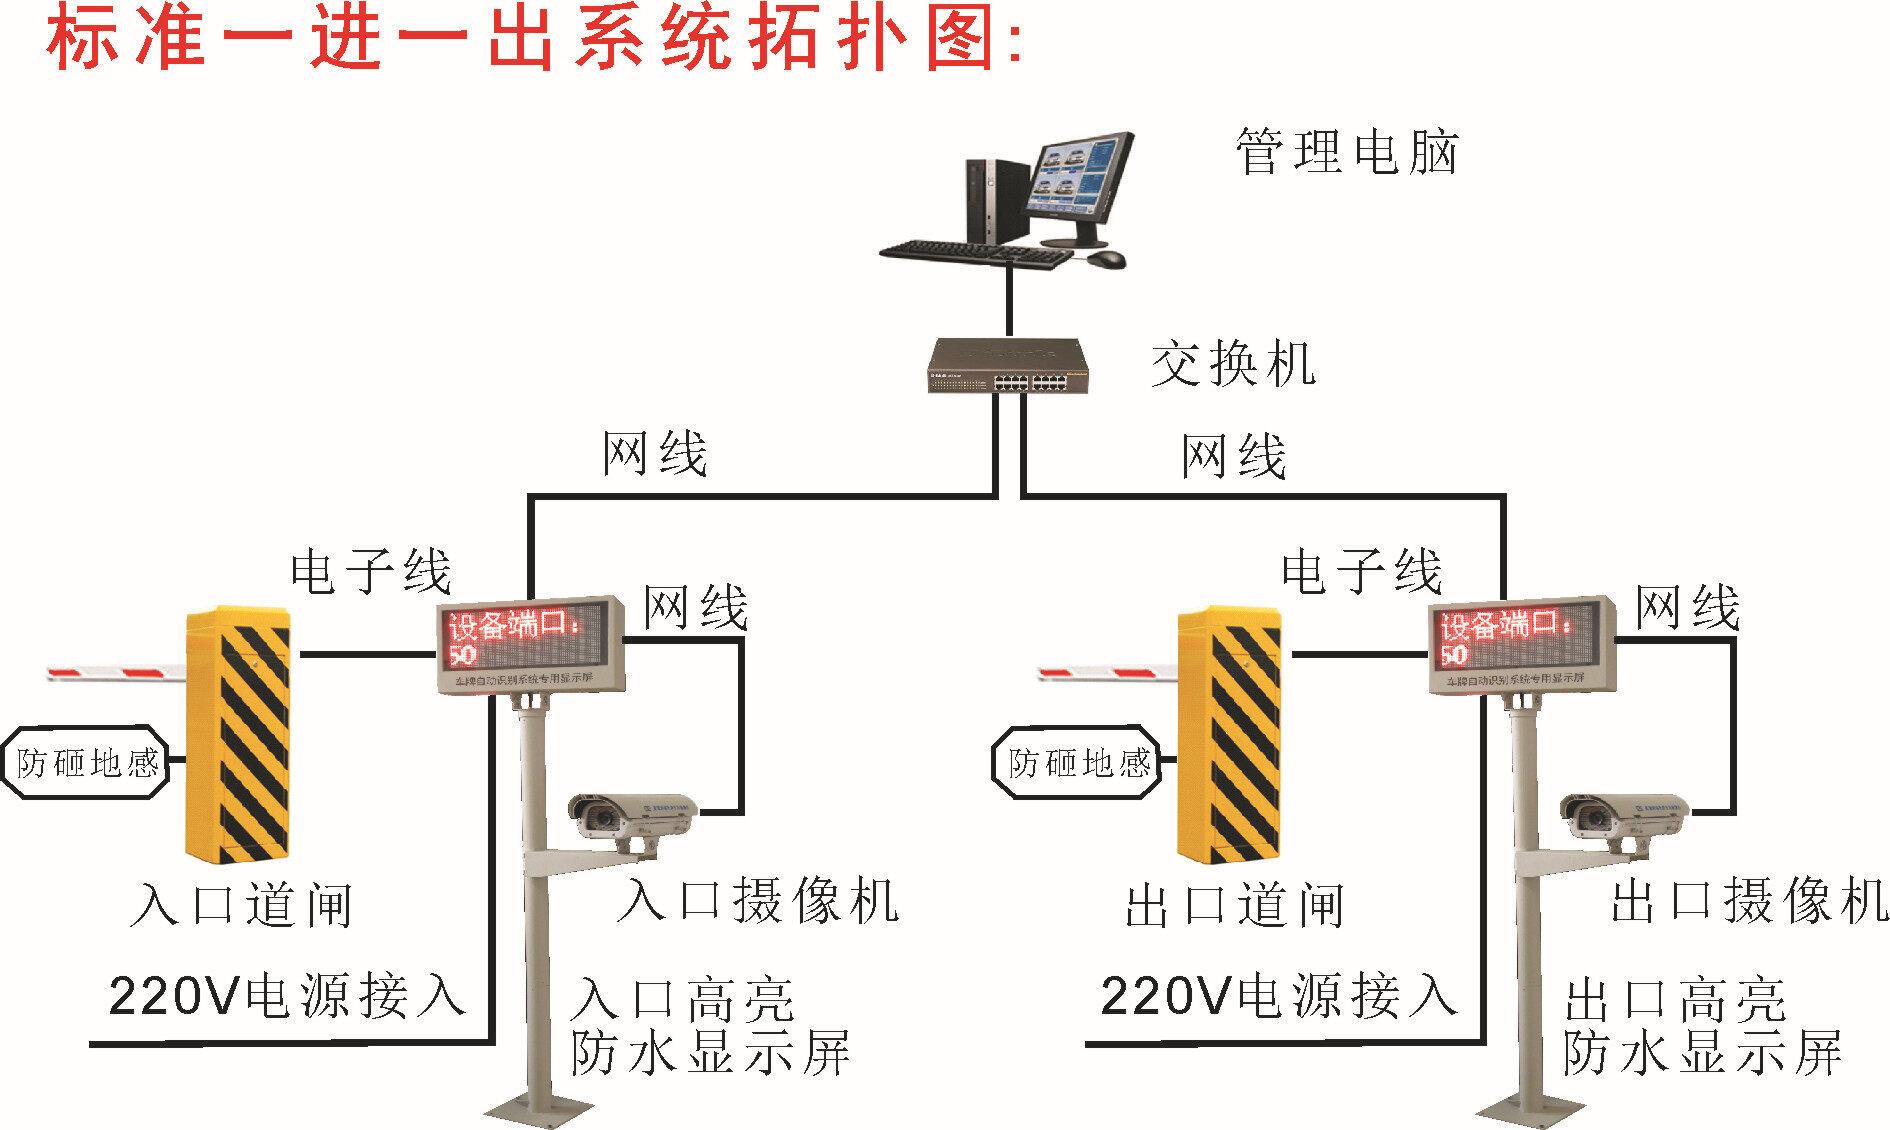 hk-210dl免刷卡车牌自动识别智能收费系统